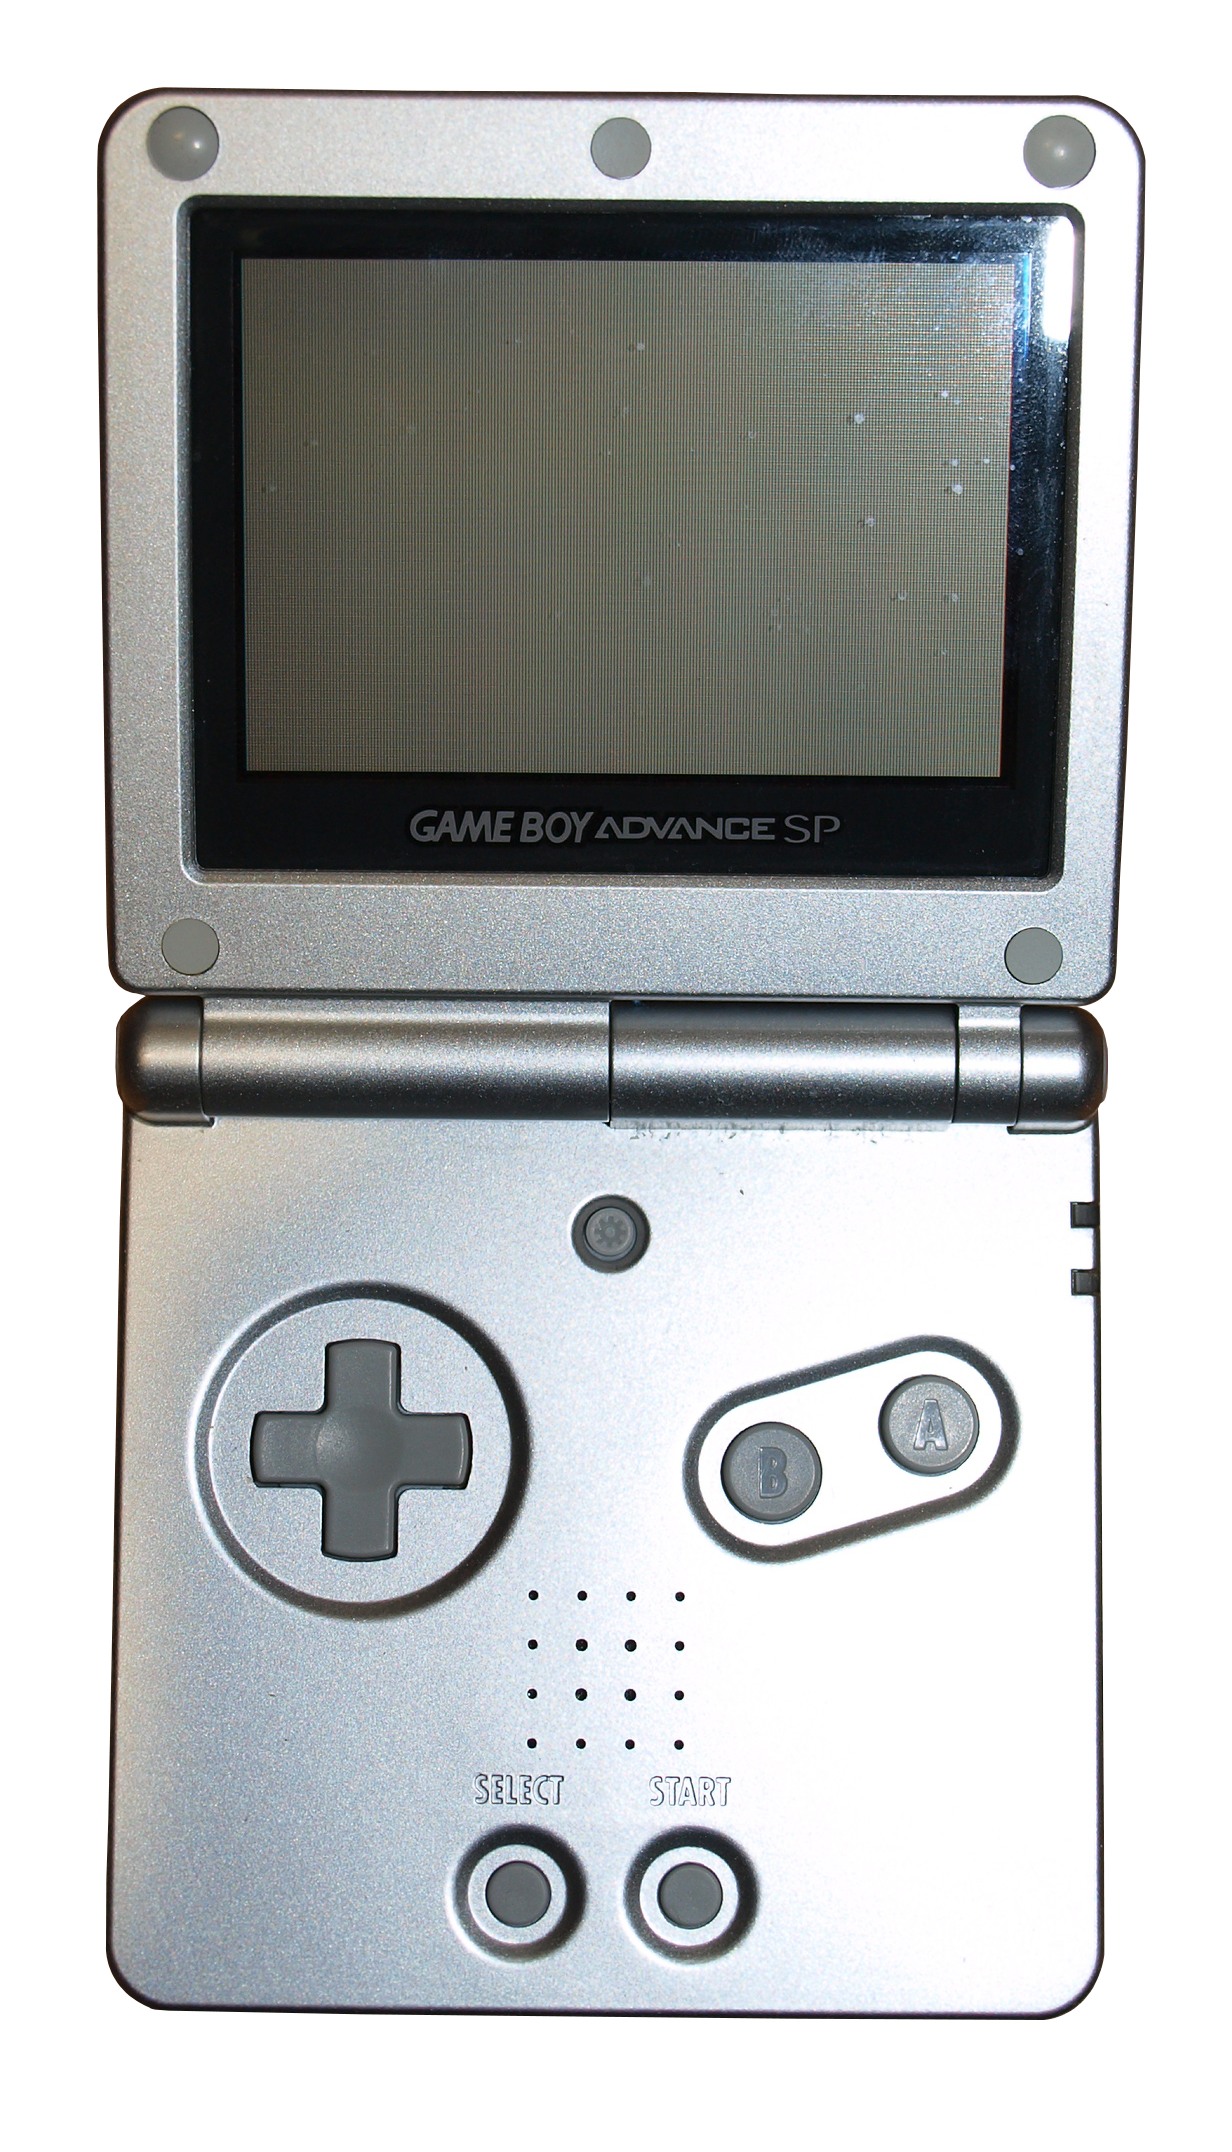 game boy advance gba - HD1232×2152